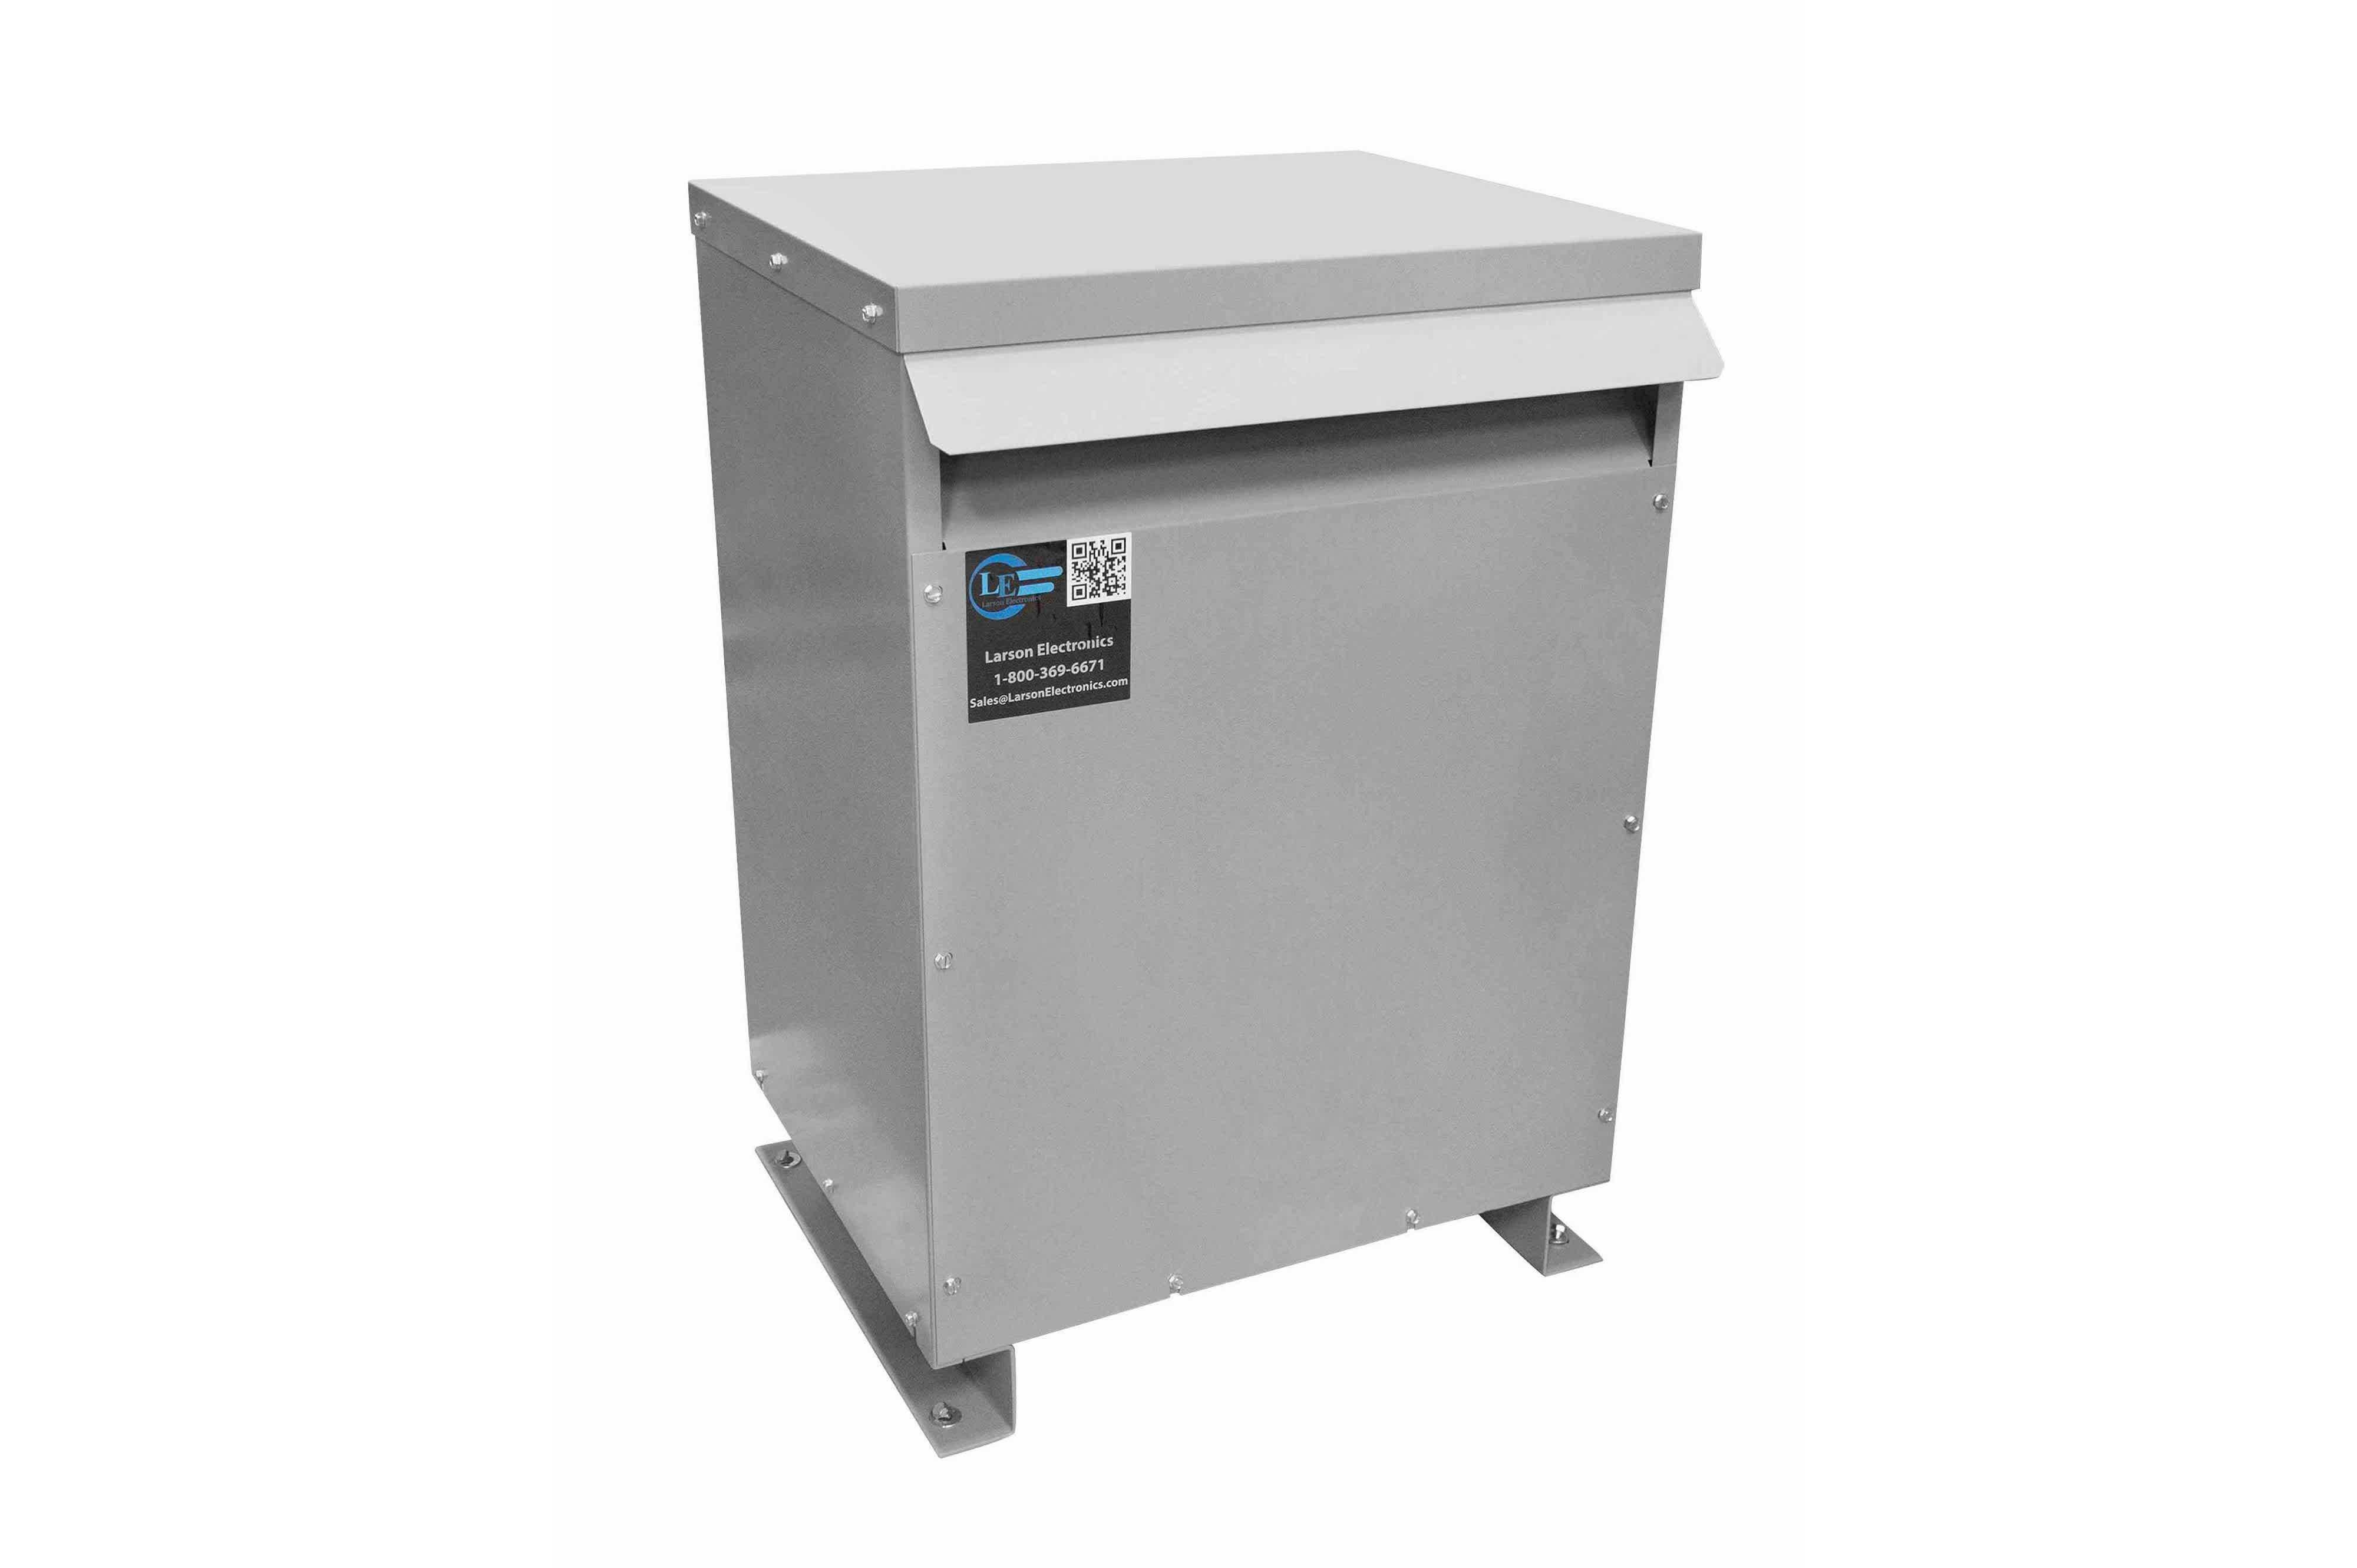 70 kVA 3PH Isolation Transformer, 460V Wye Primary, 400Y/231 Wye-N Secondary, N3R, Ventilated, 60 Hz